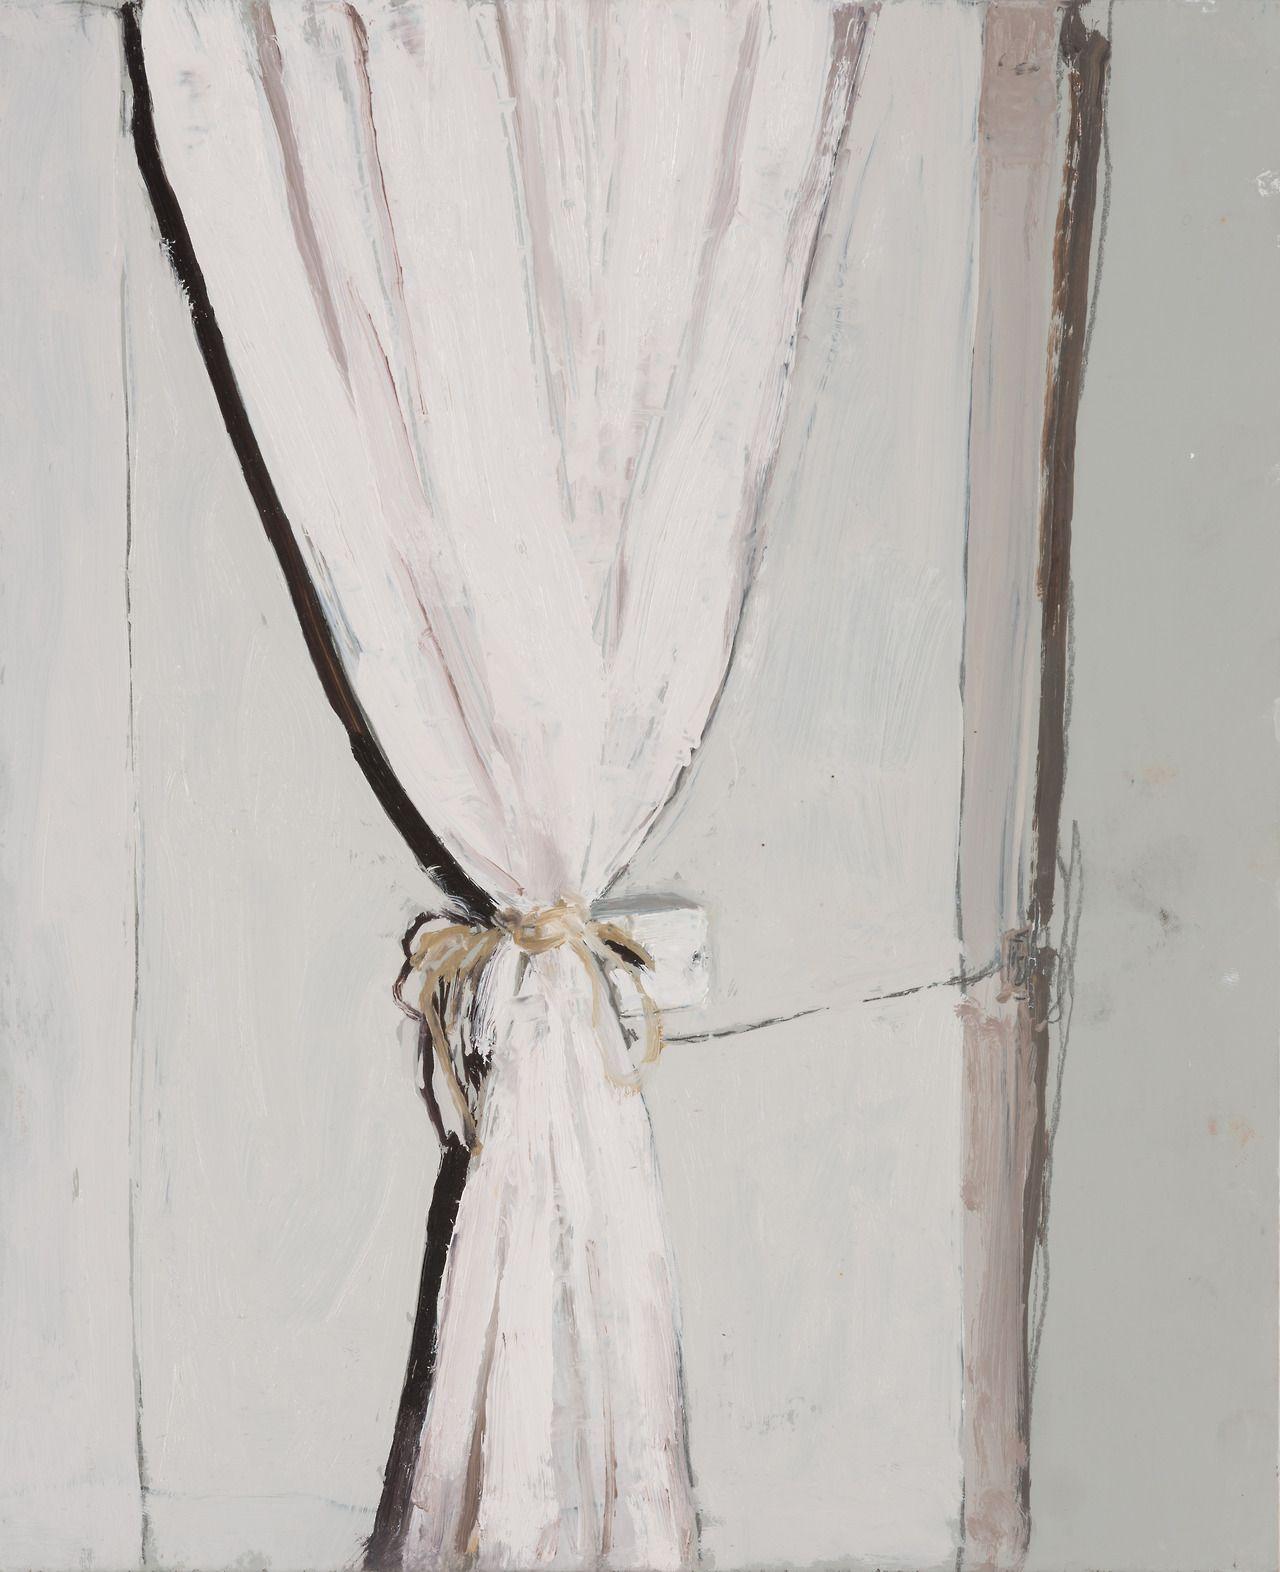 tinaut: Untitled, 2013. Oil on board, 29 x 21 cm.